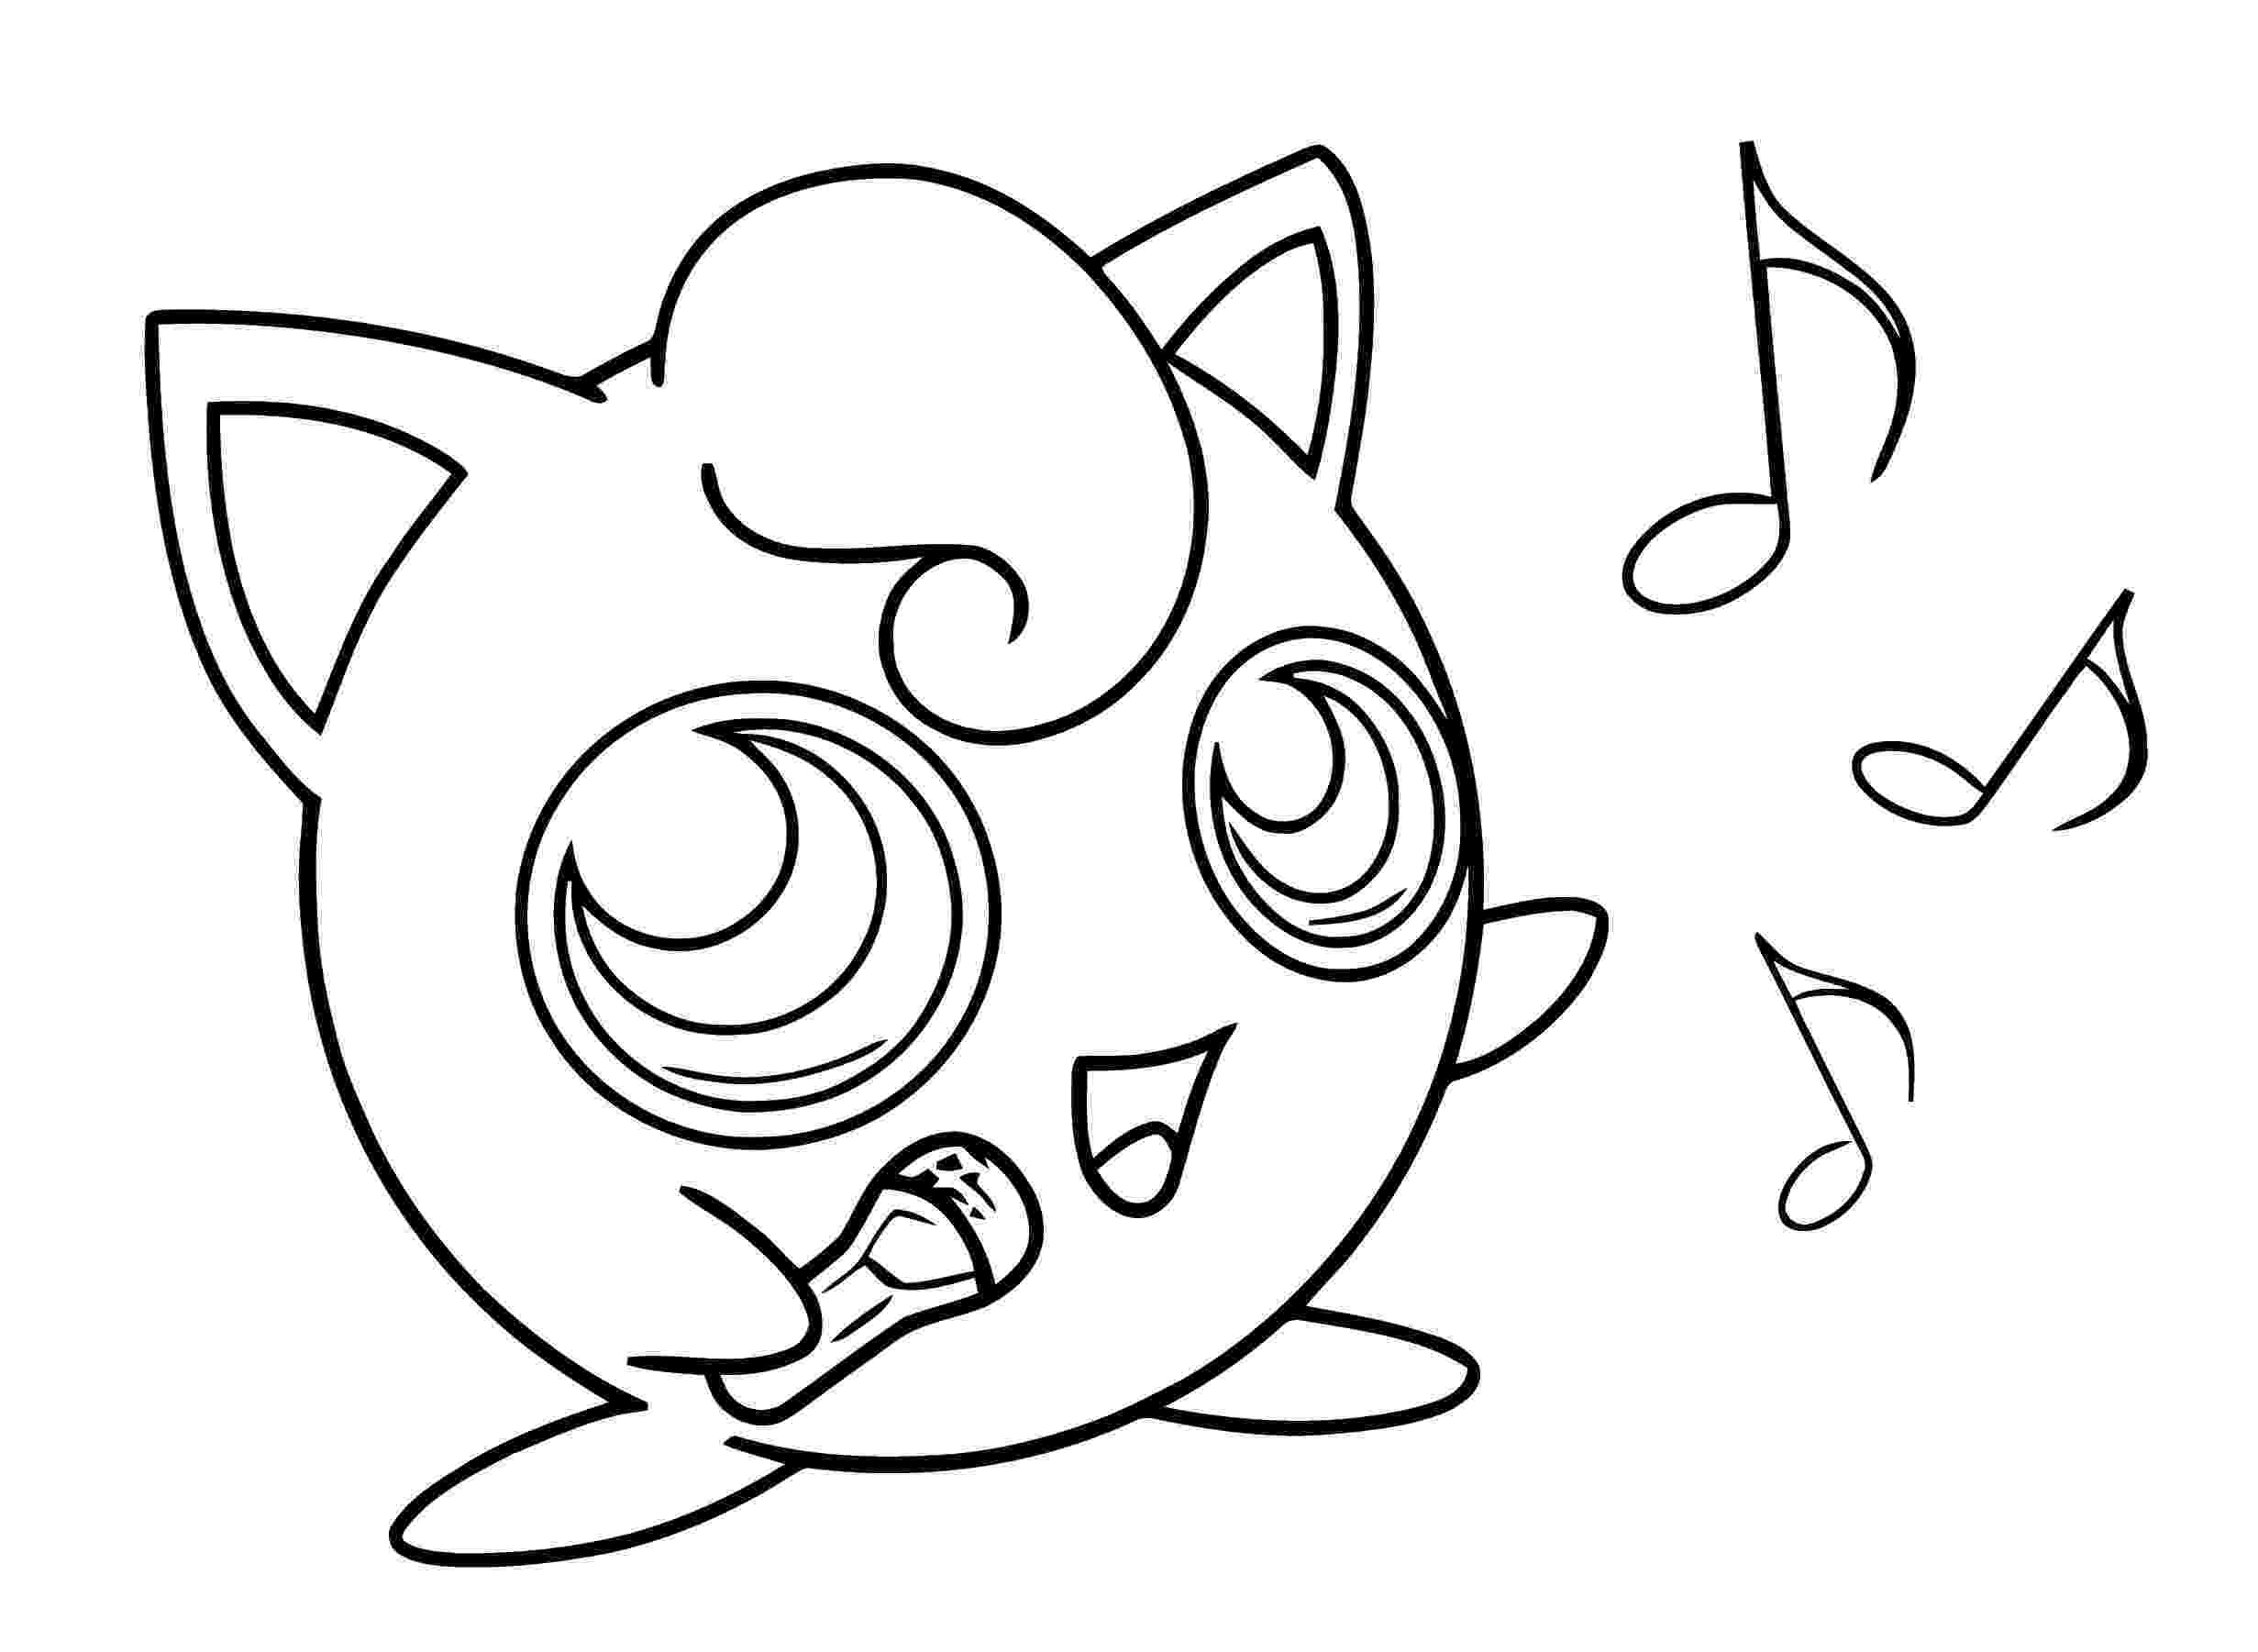 jigglypuff coloring pages pokemon jigglypuff coloring page 01 coloring page central coloring pages jigglypuff